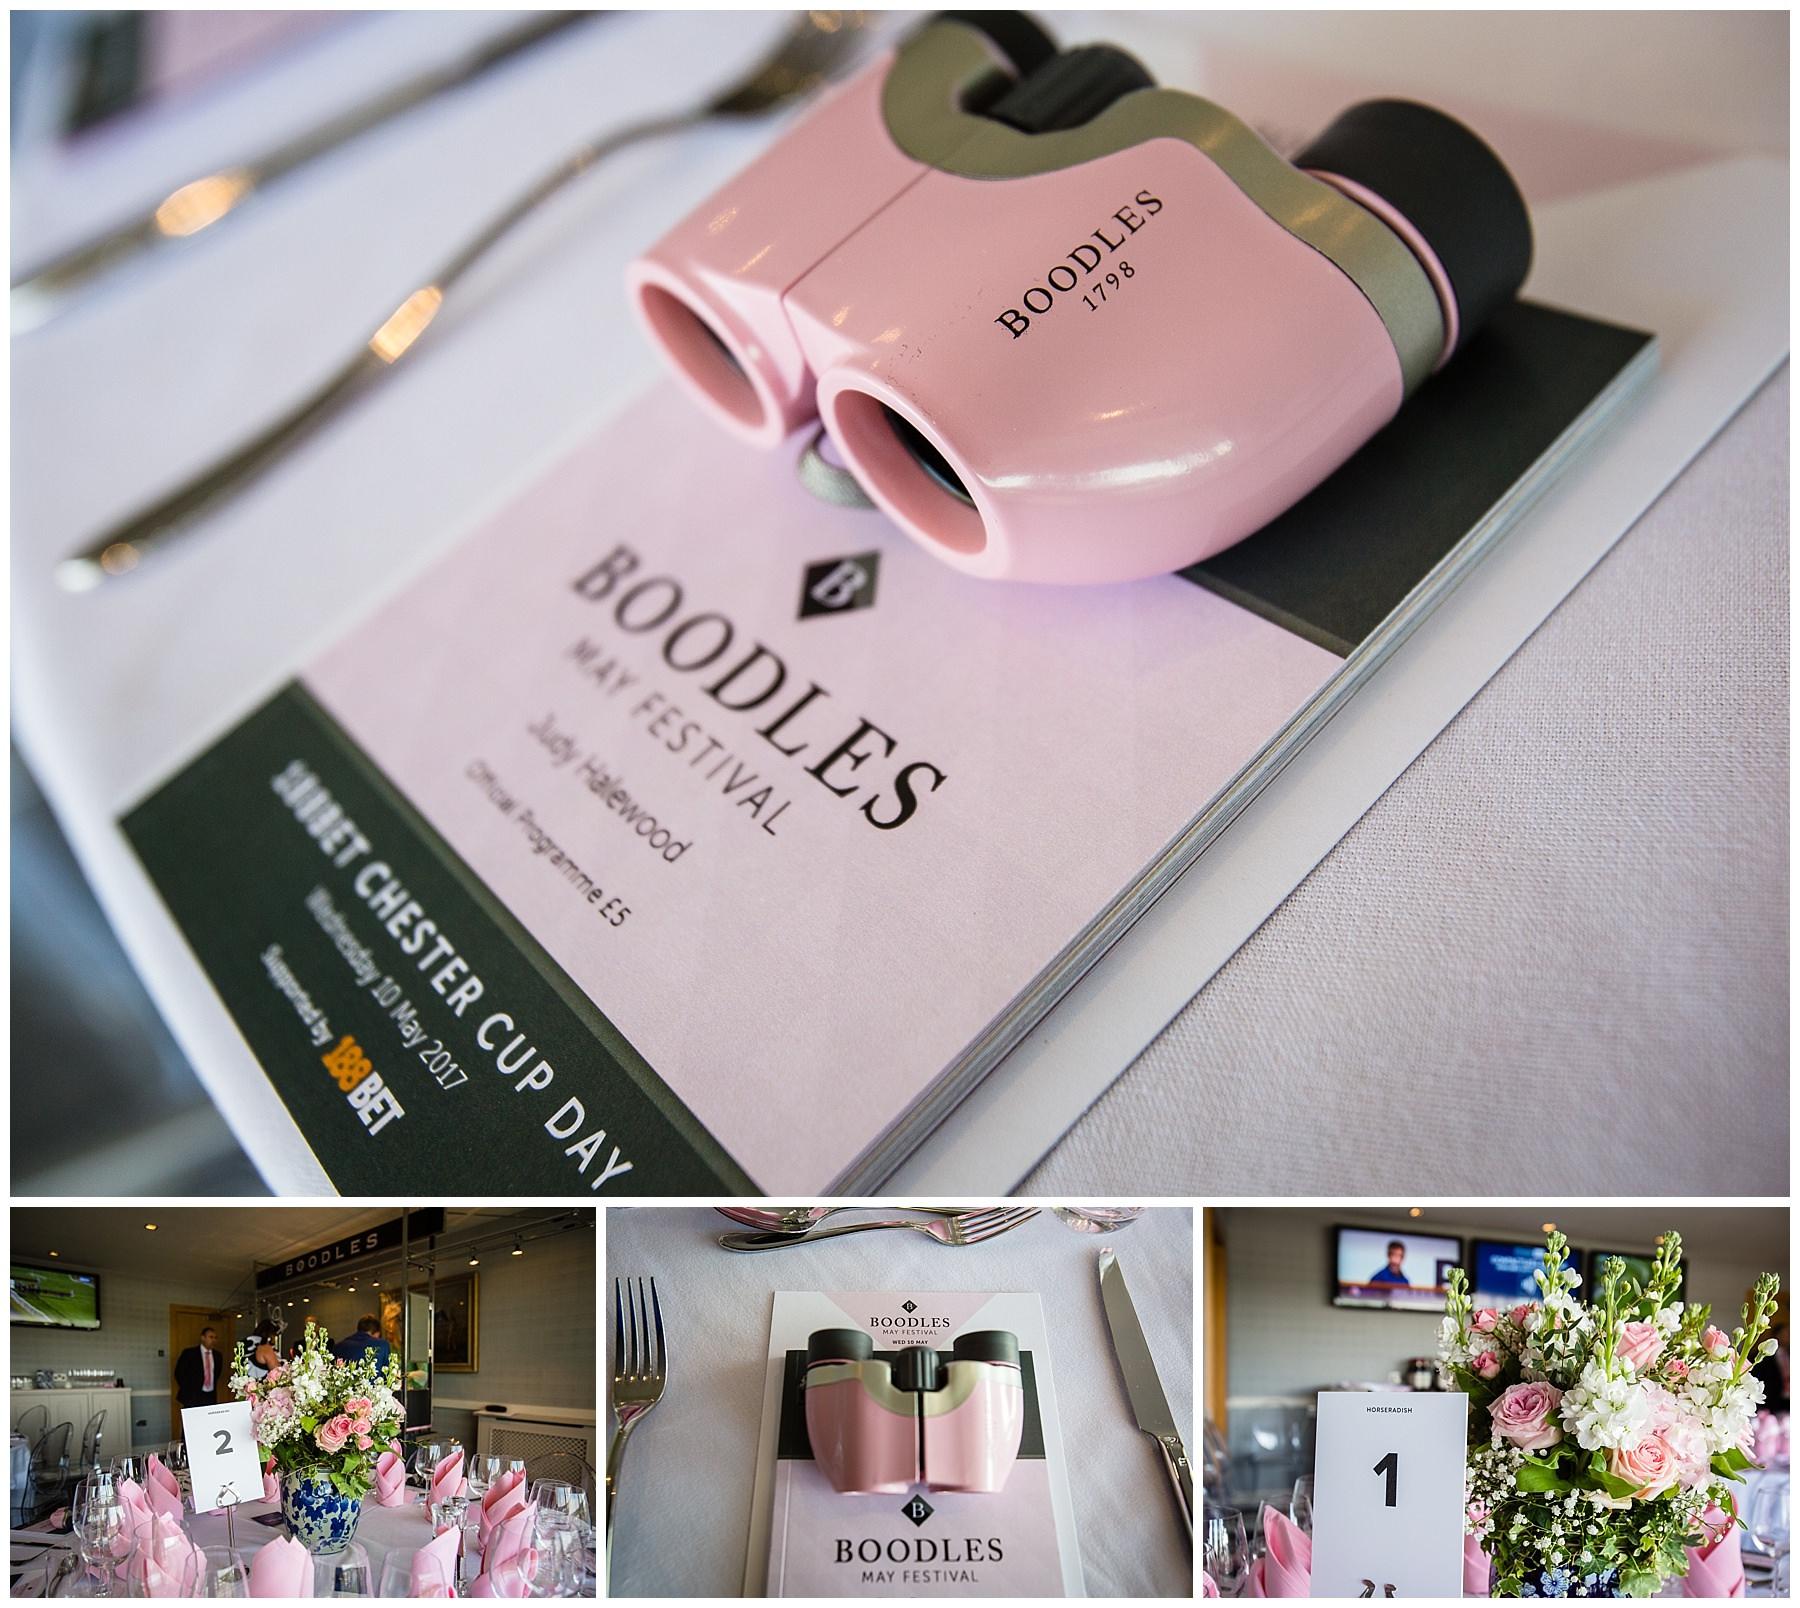 Boodles May Festival 2017 - pink boodles binnochulars